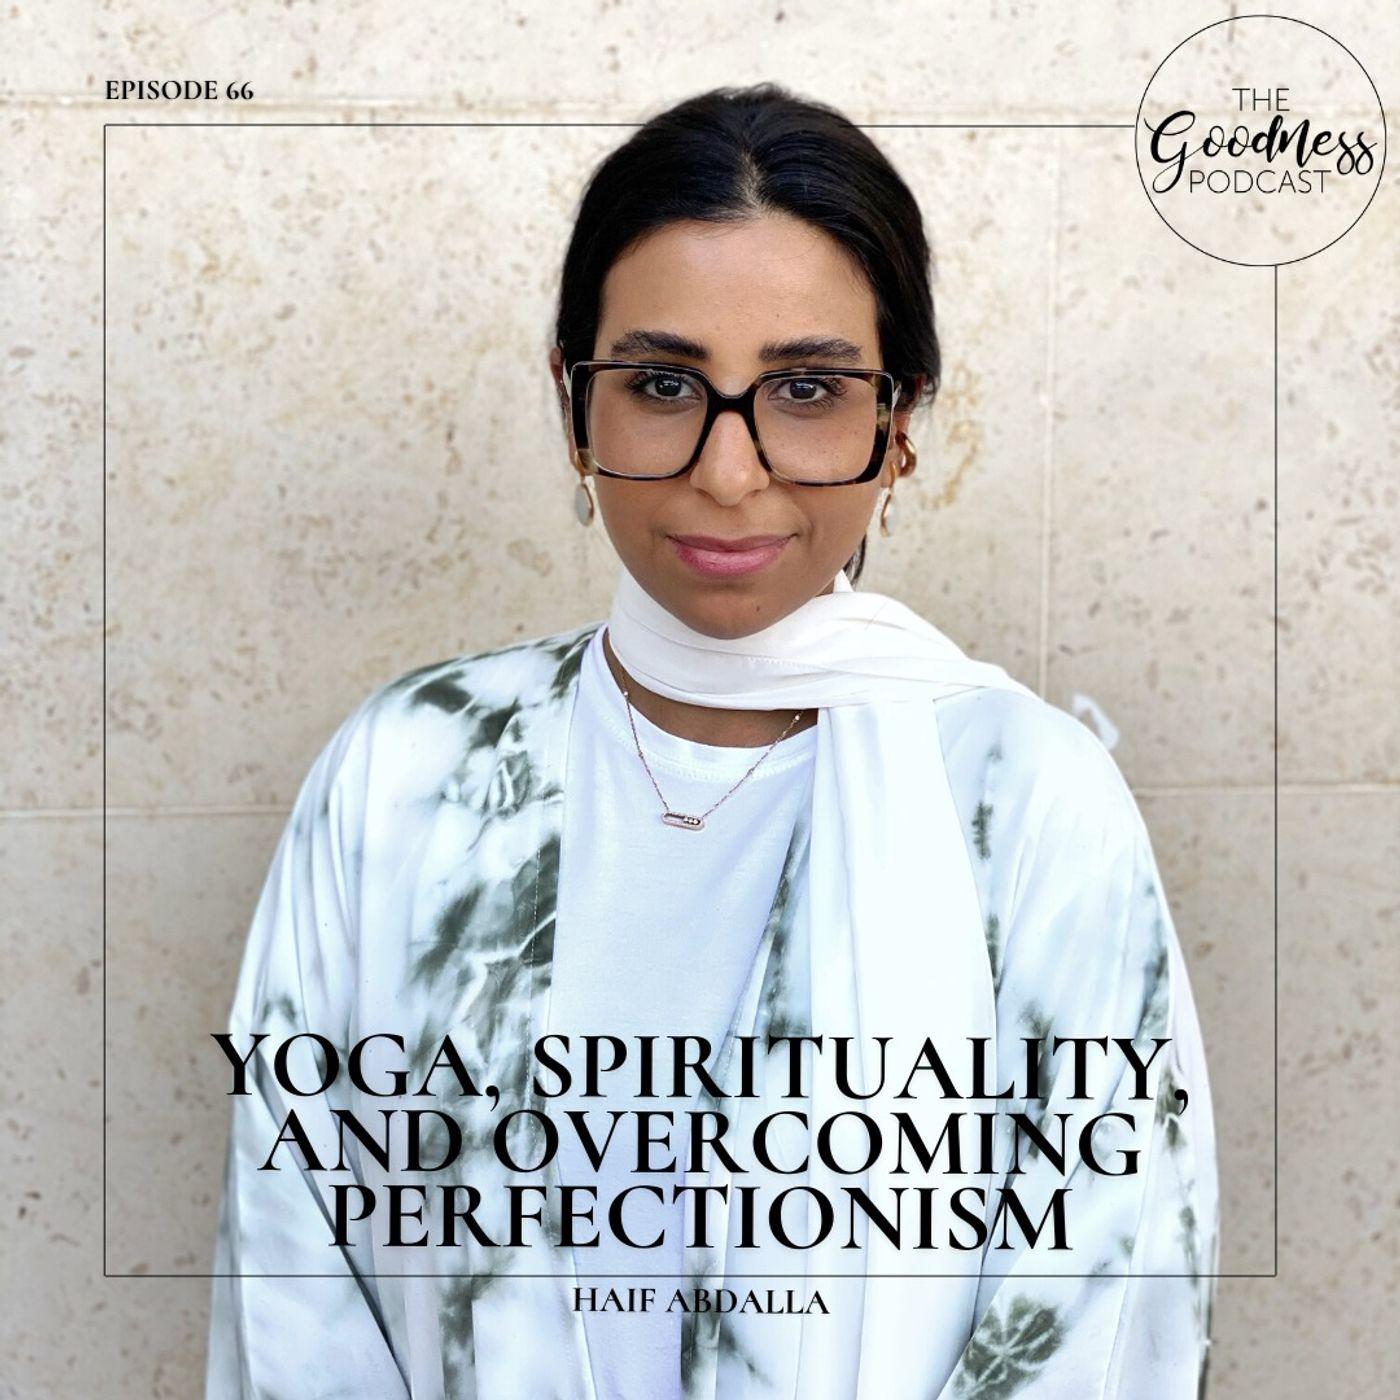 Haif Abdalla: Yoga, Spirituality, and Overcoming Perfectionism